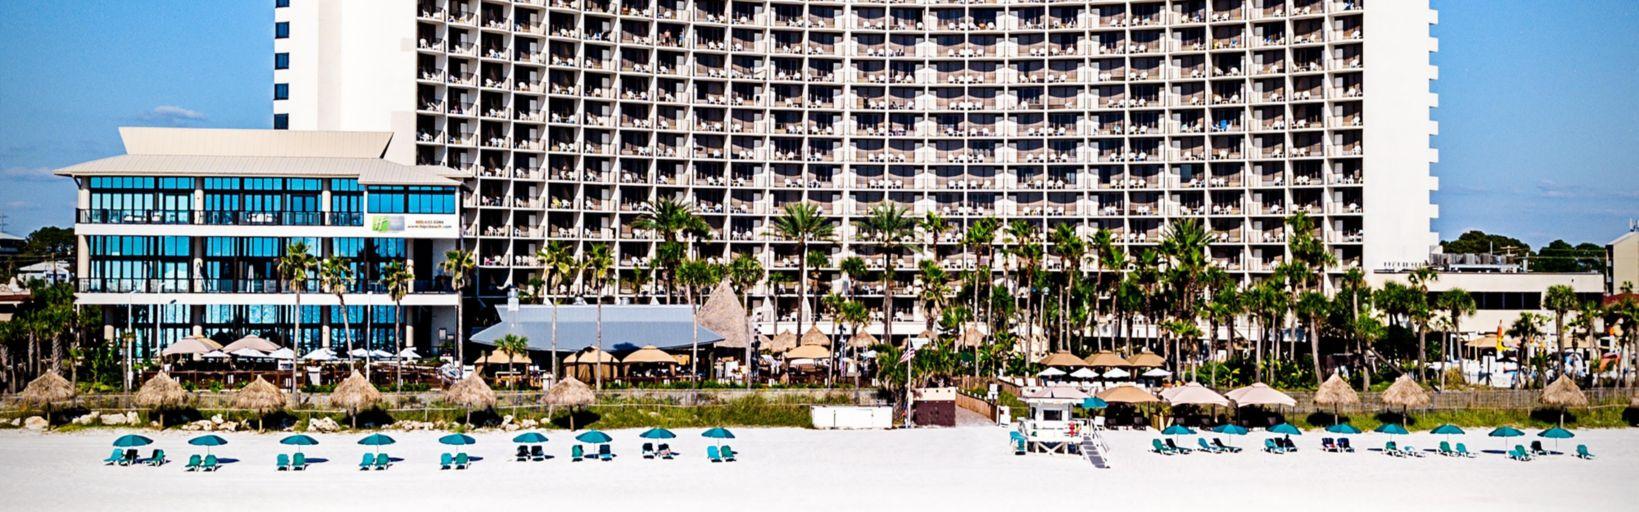 Holiday Inn Resort Panama City Beach Directly On The Gulf Of Mexic